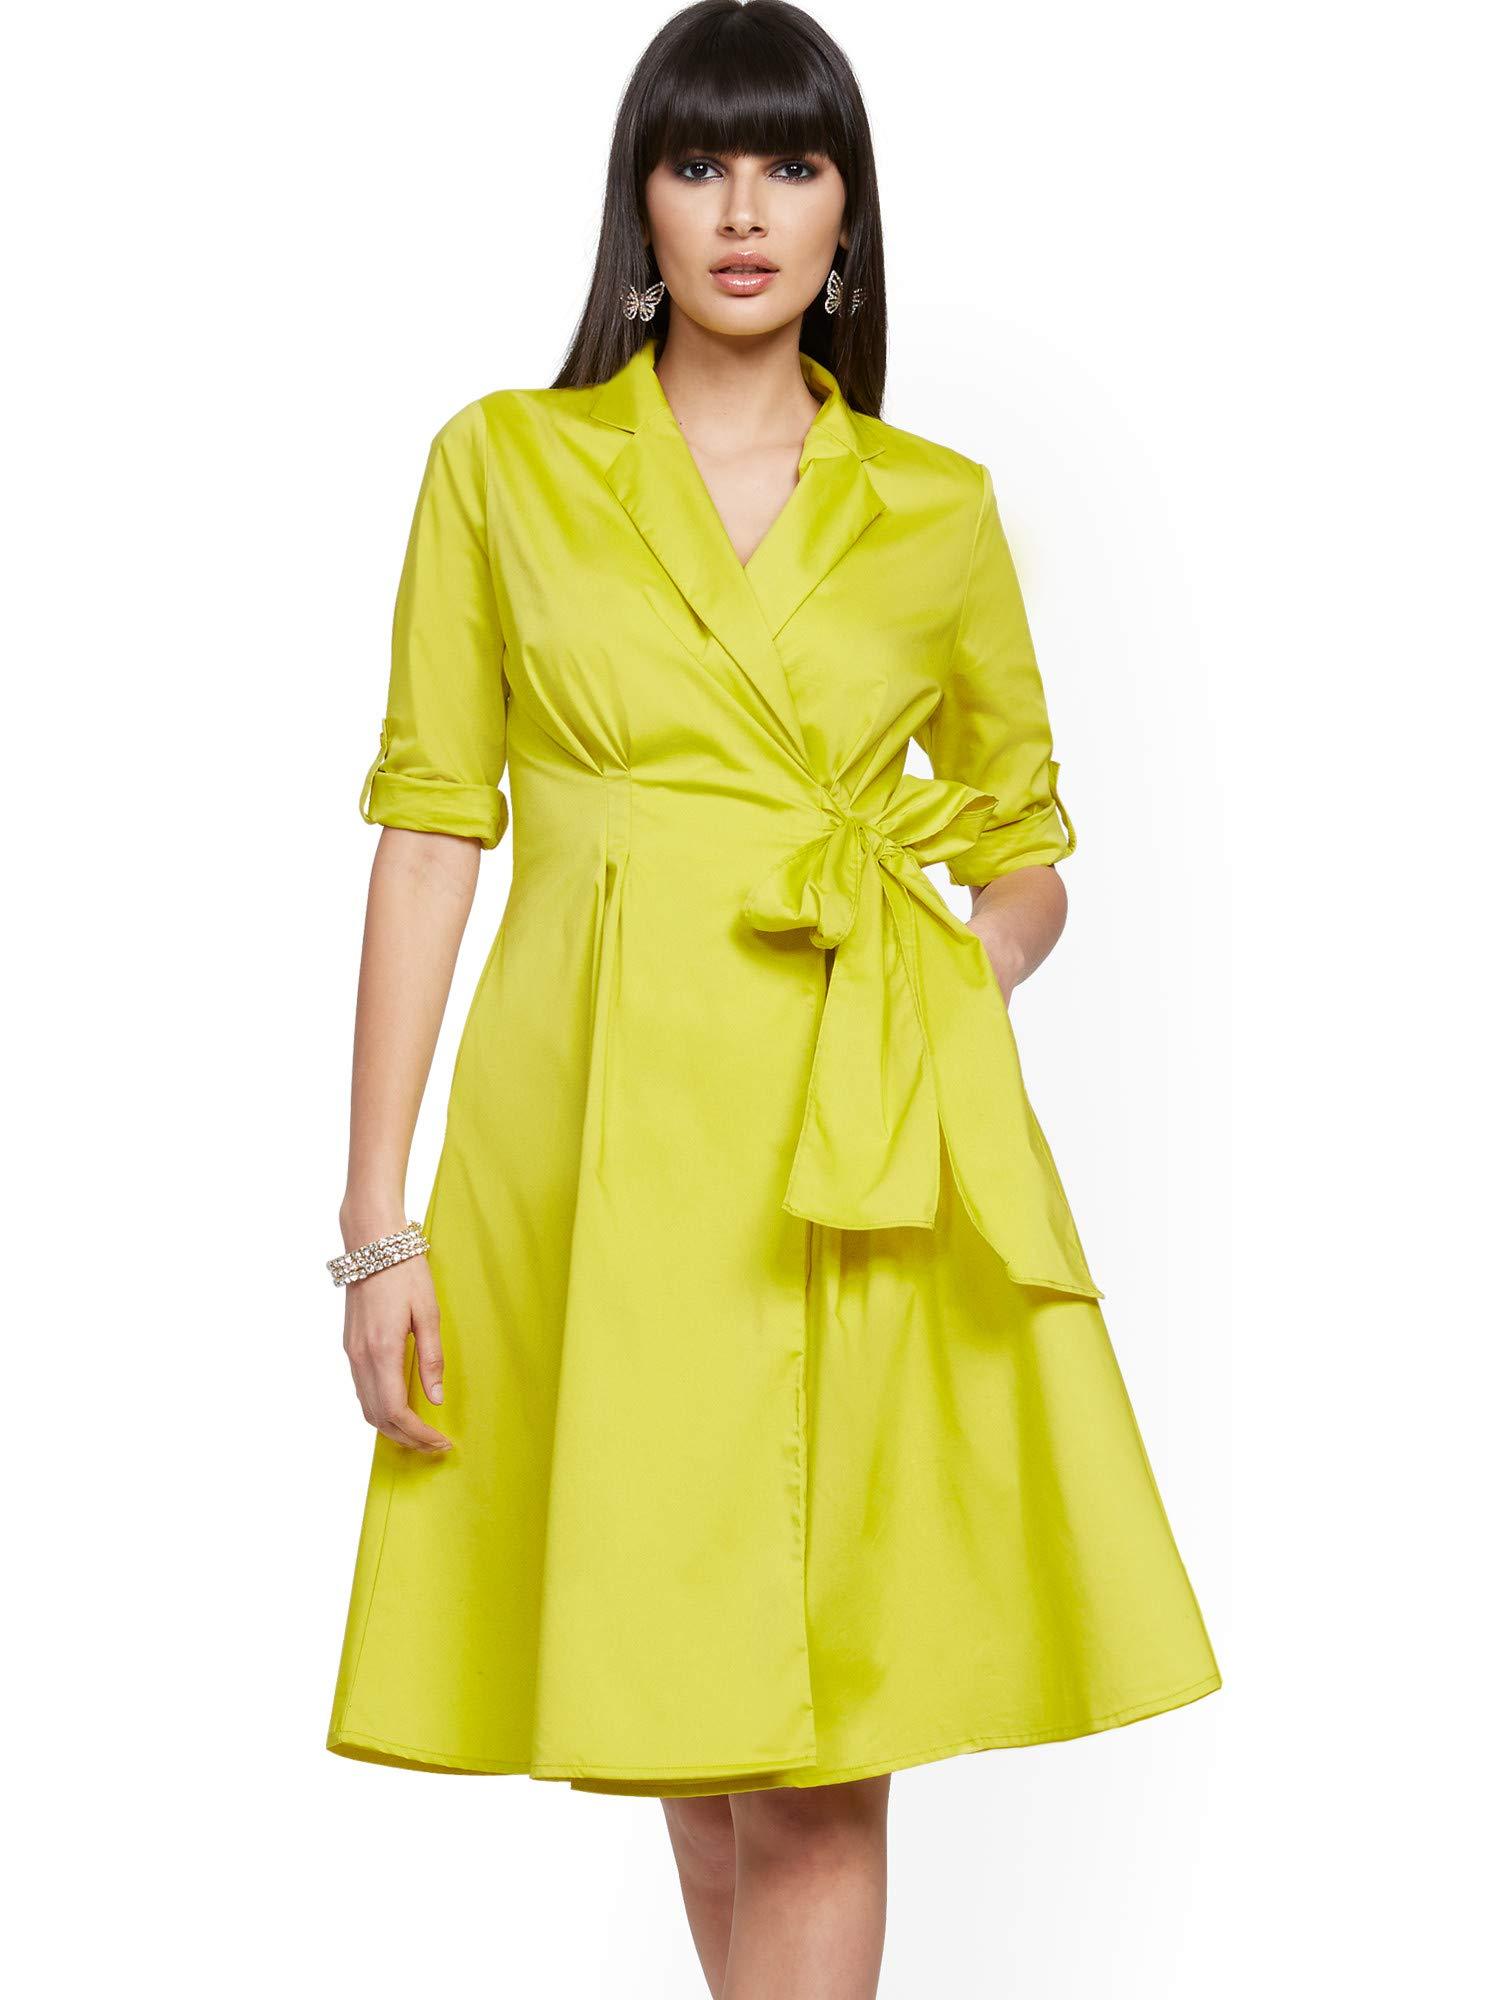 Available at Amazon: New York & Co. Women's Poplin Wrap Dress